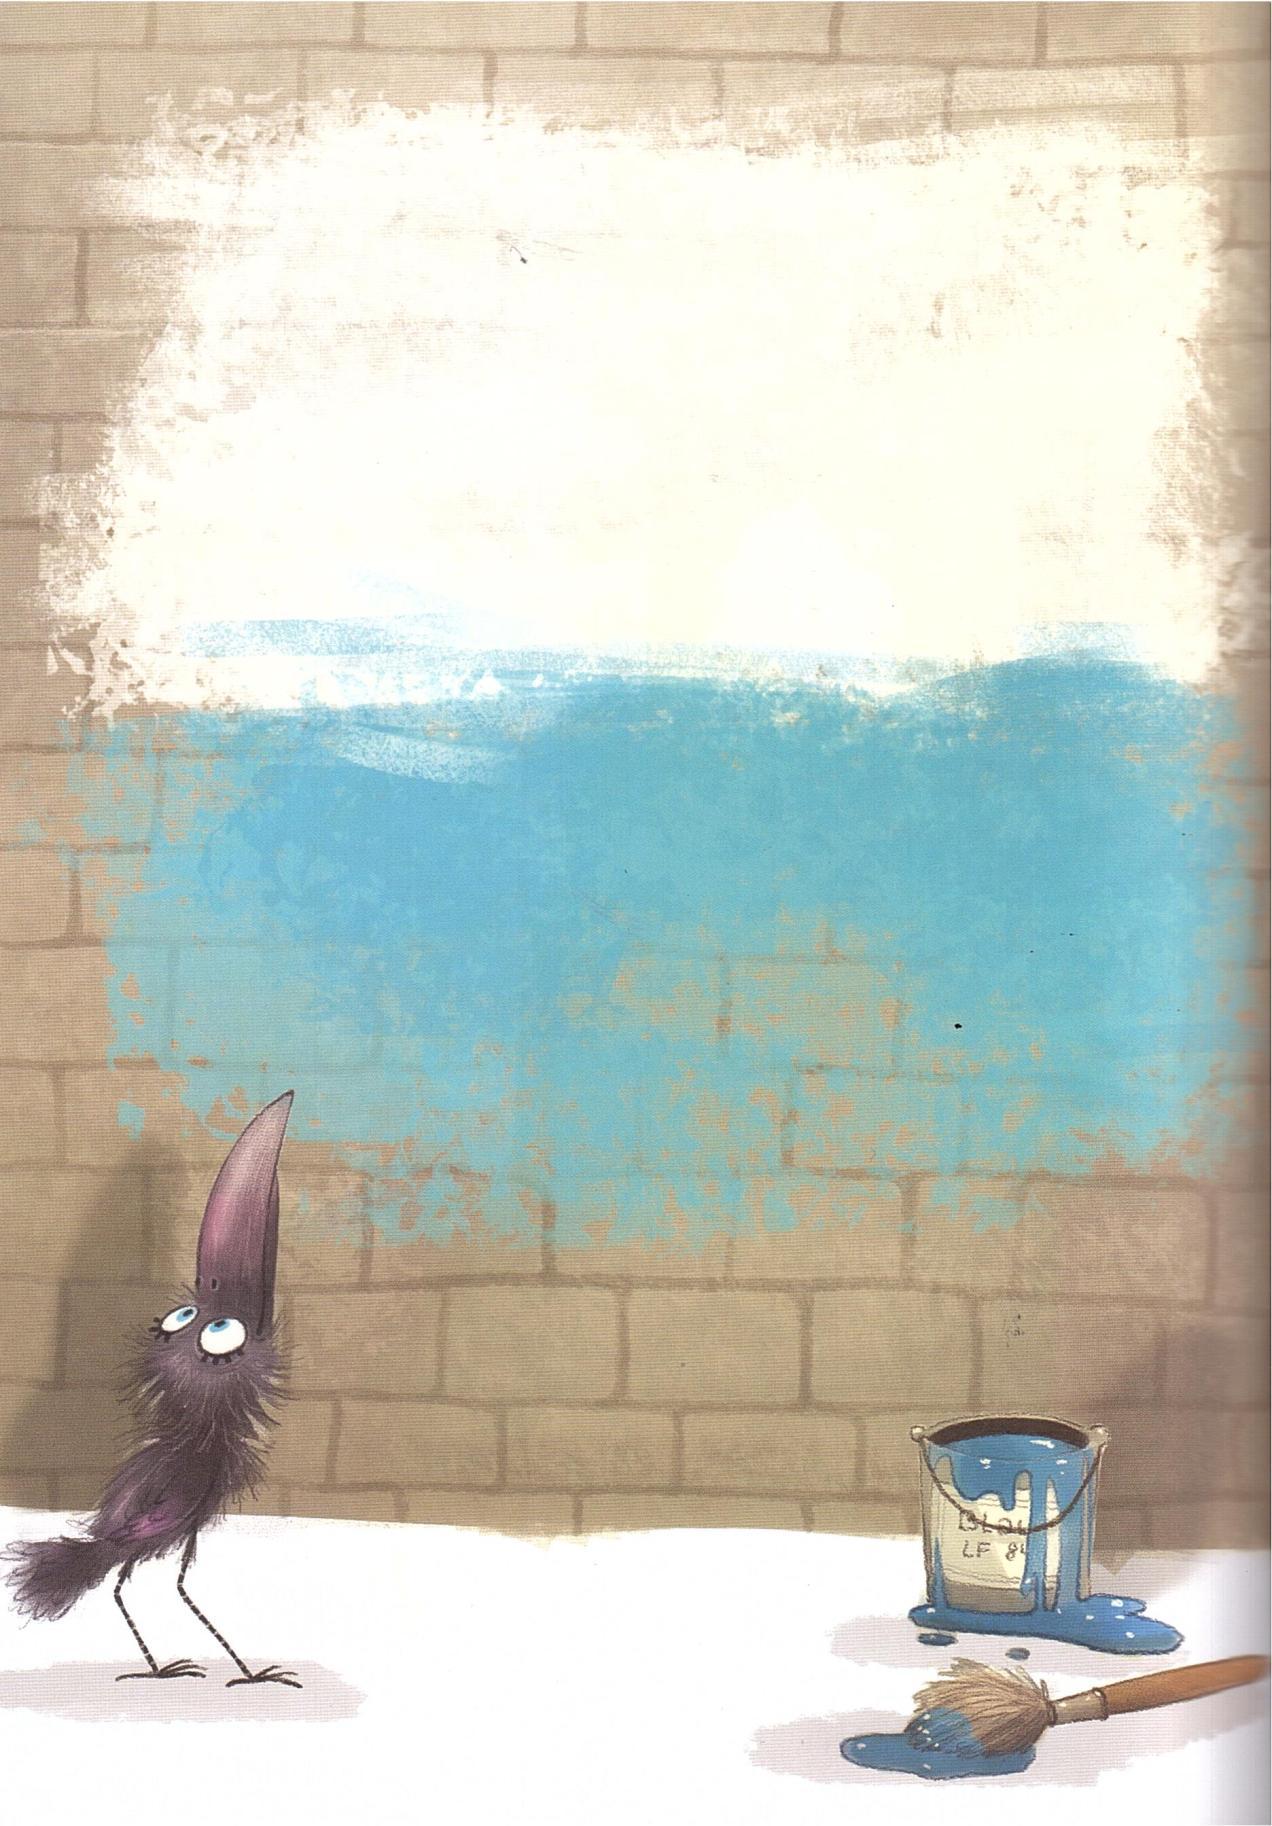 bärundkrähe